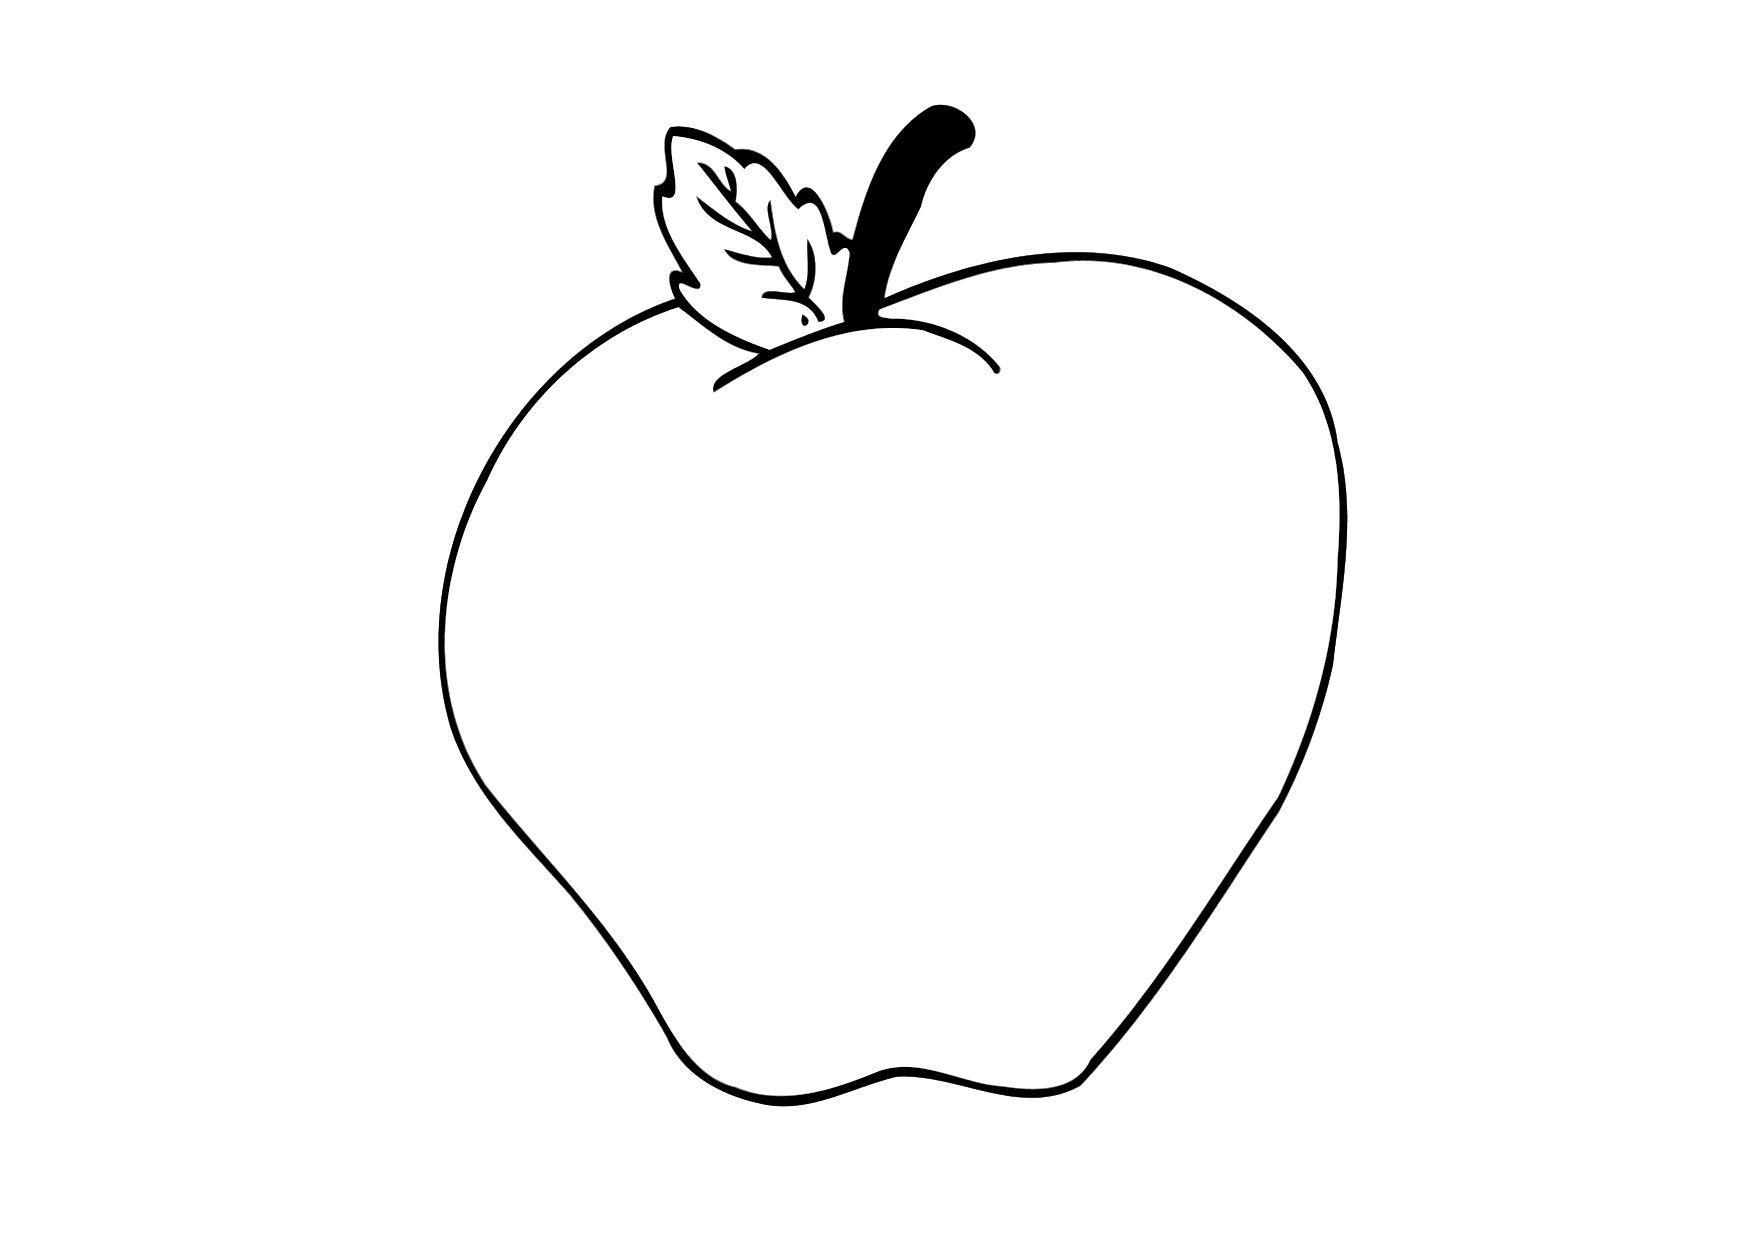 Dibujo para colorear Manzana - Img 12305